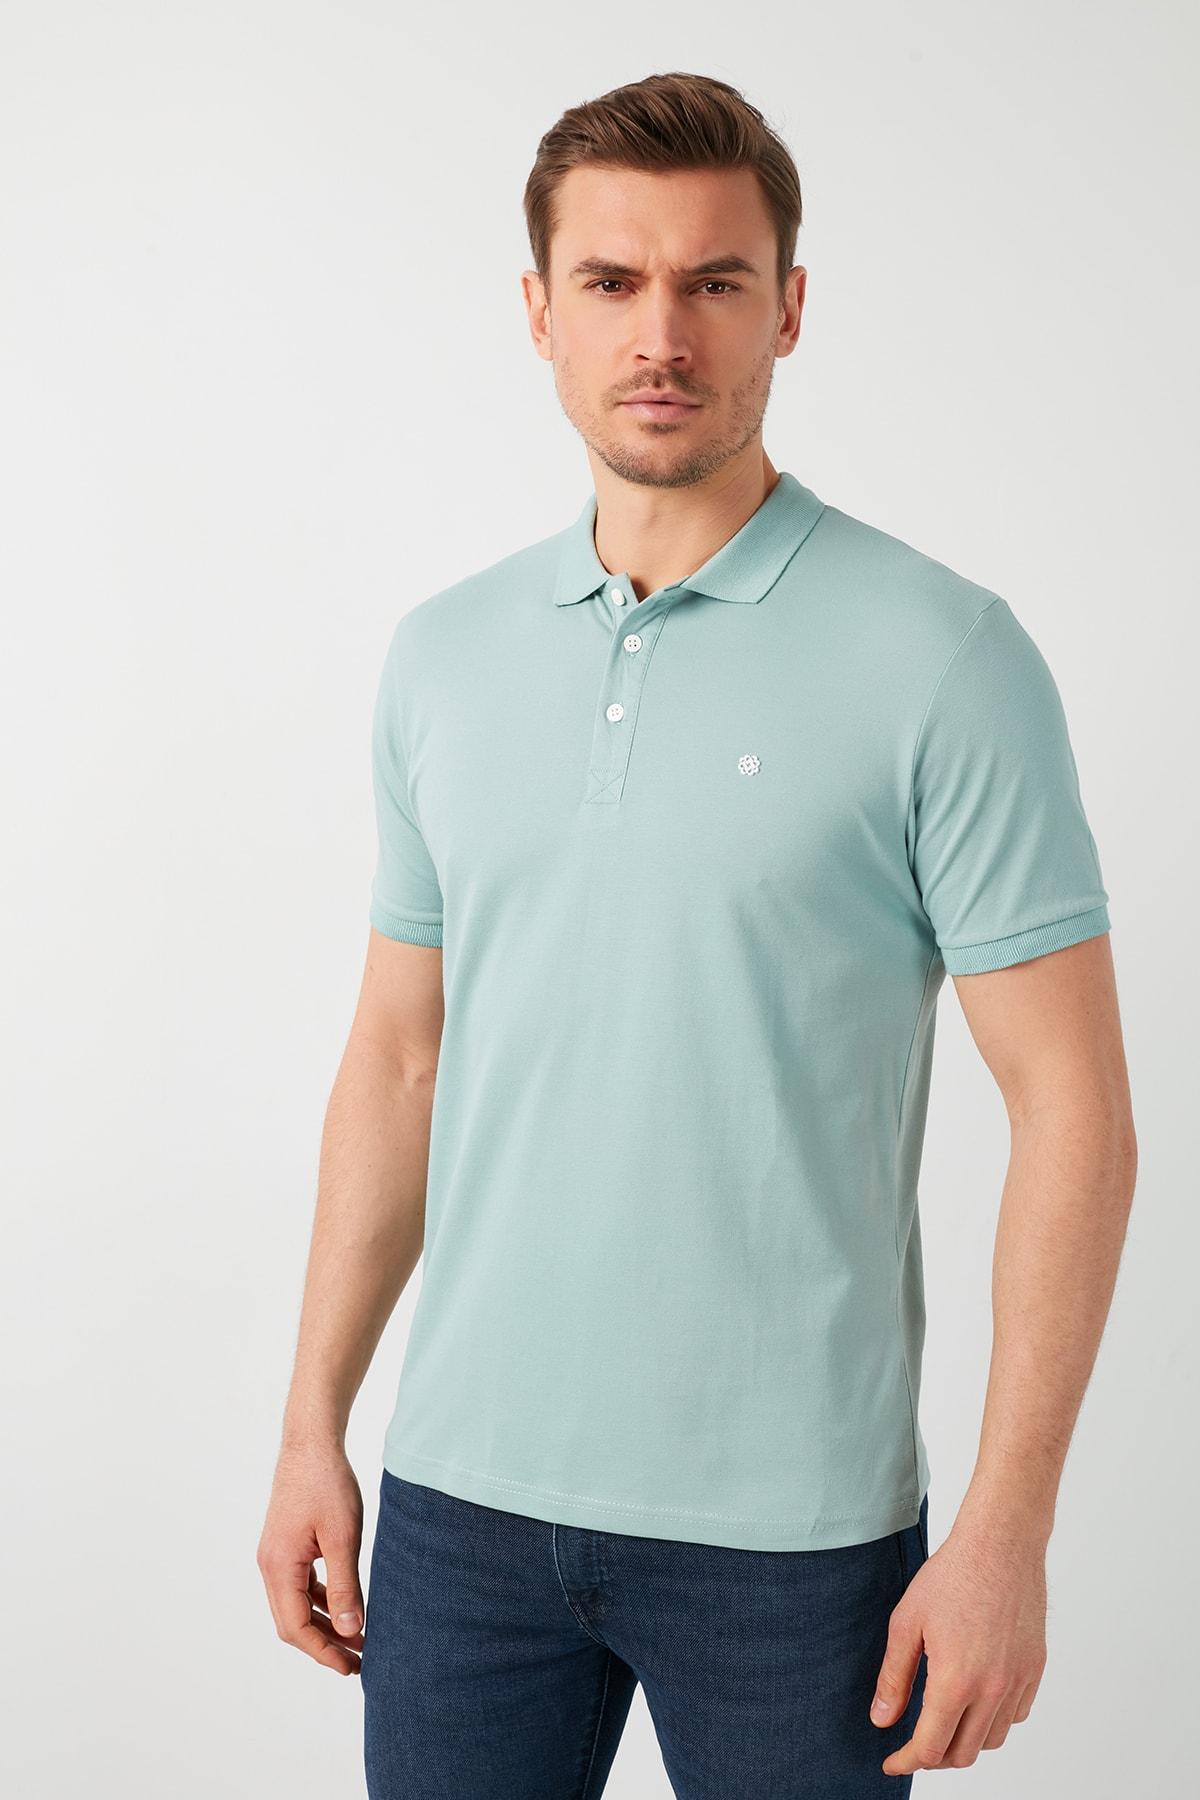 Buratti Pamuklu Düğmeli Polo T Shirt 0438101 2